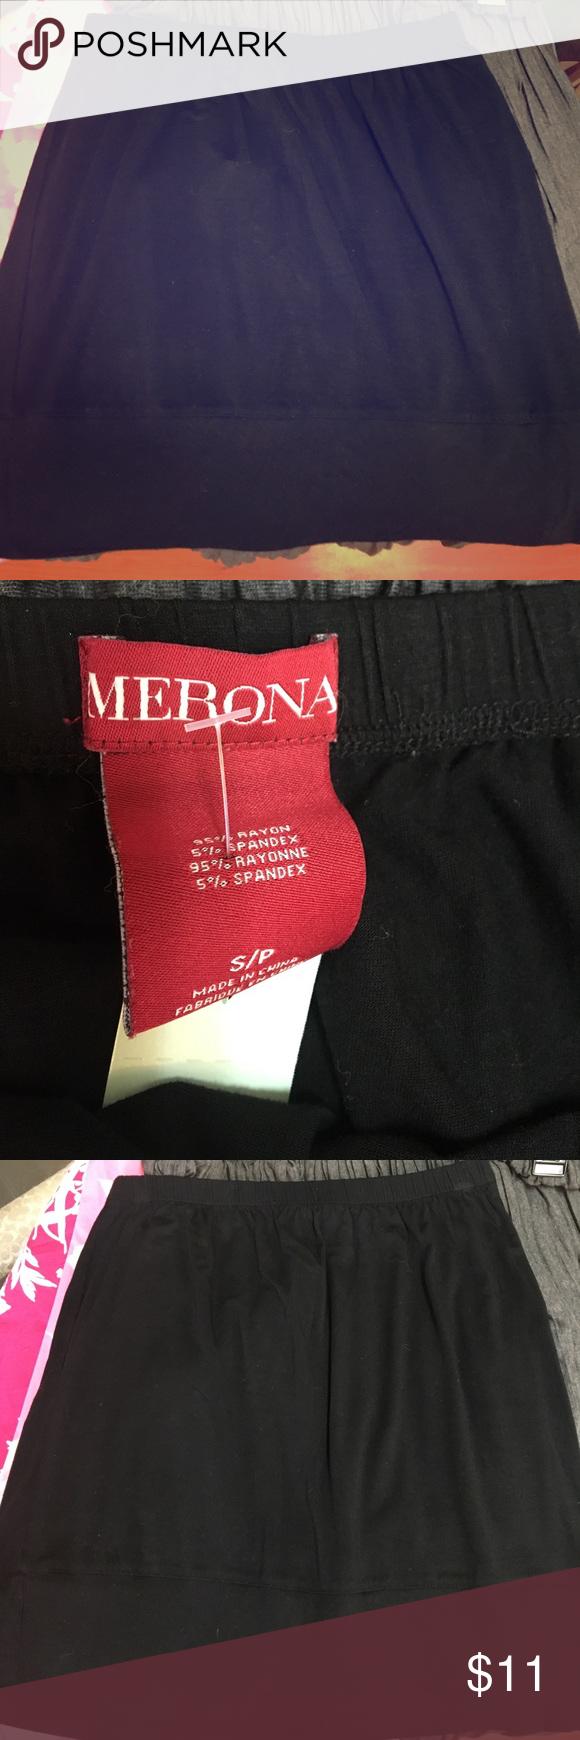 Merona black skirt Excellent condition black Merona skirt size small Merona Skirts Midi